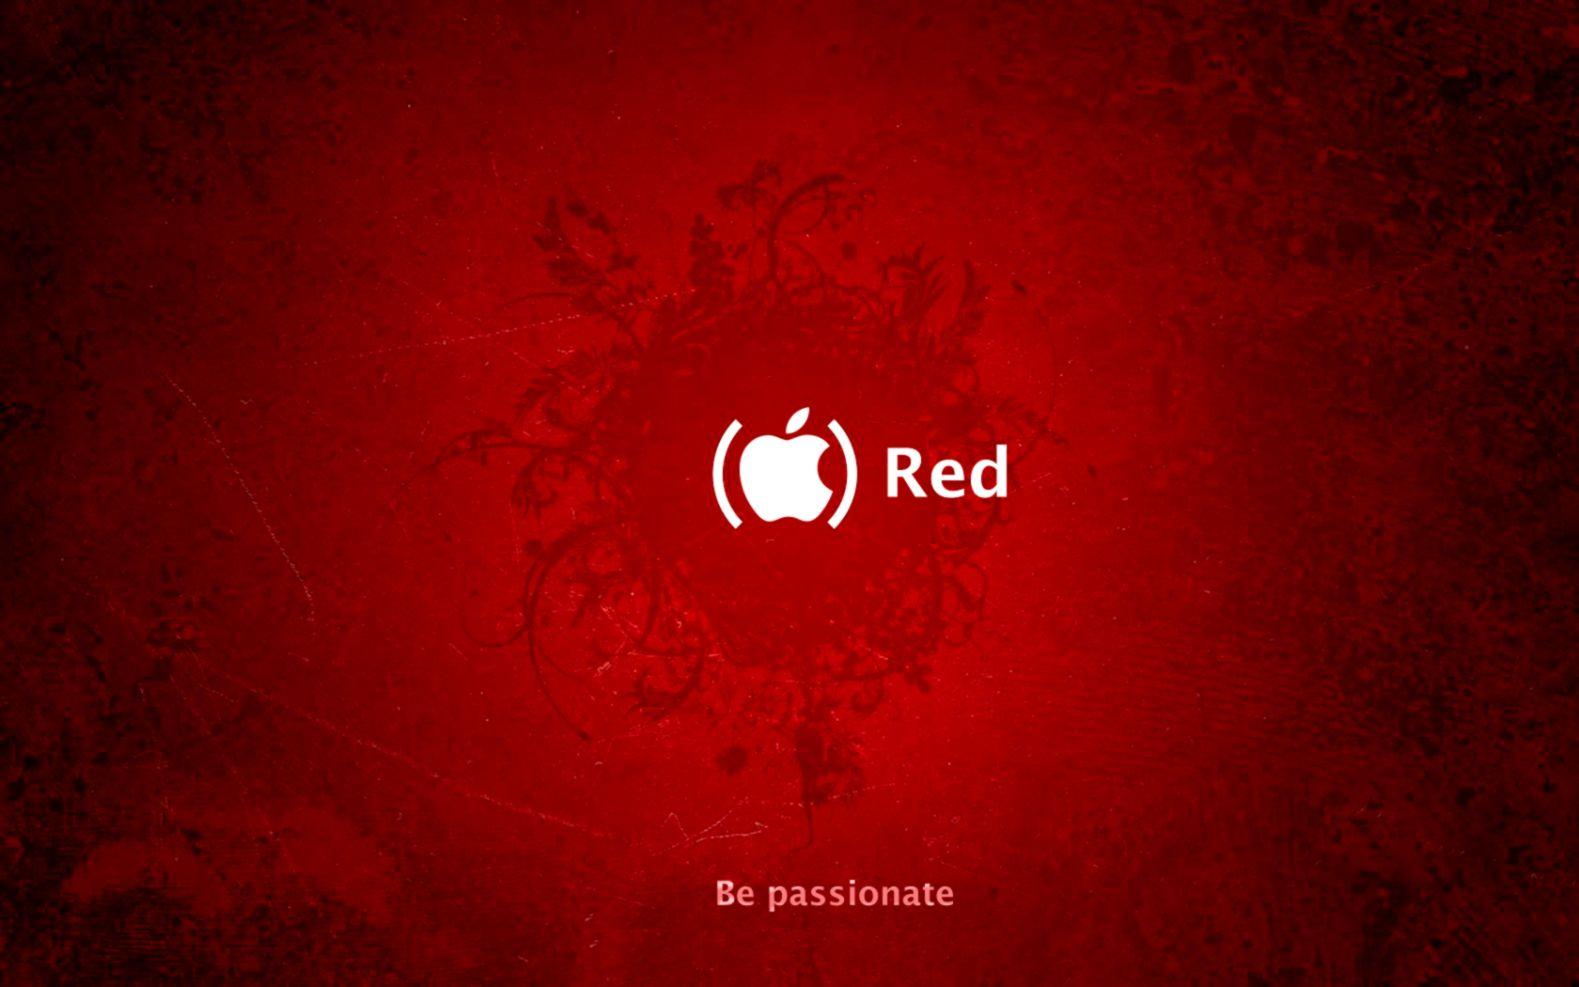 Mac Apple Wallpapers Hd Apple Red | Wallpapers 4k